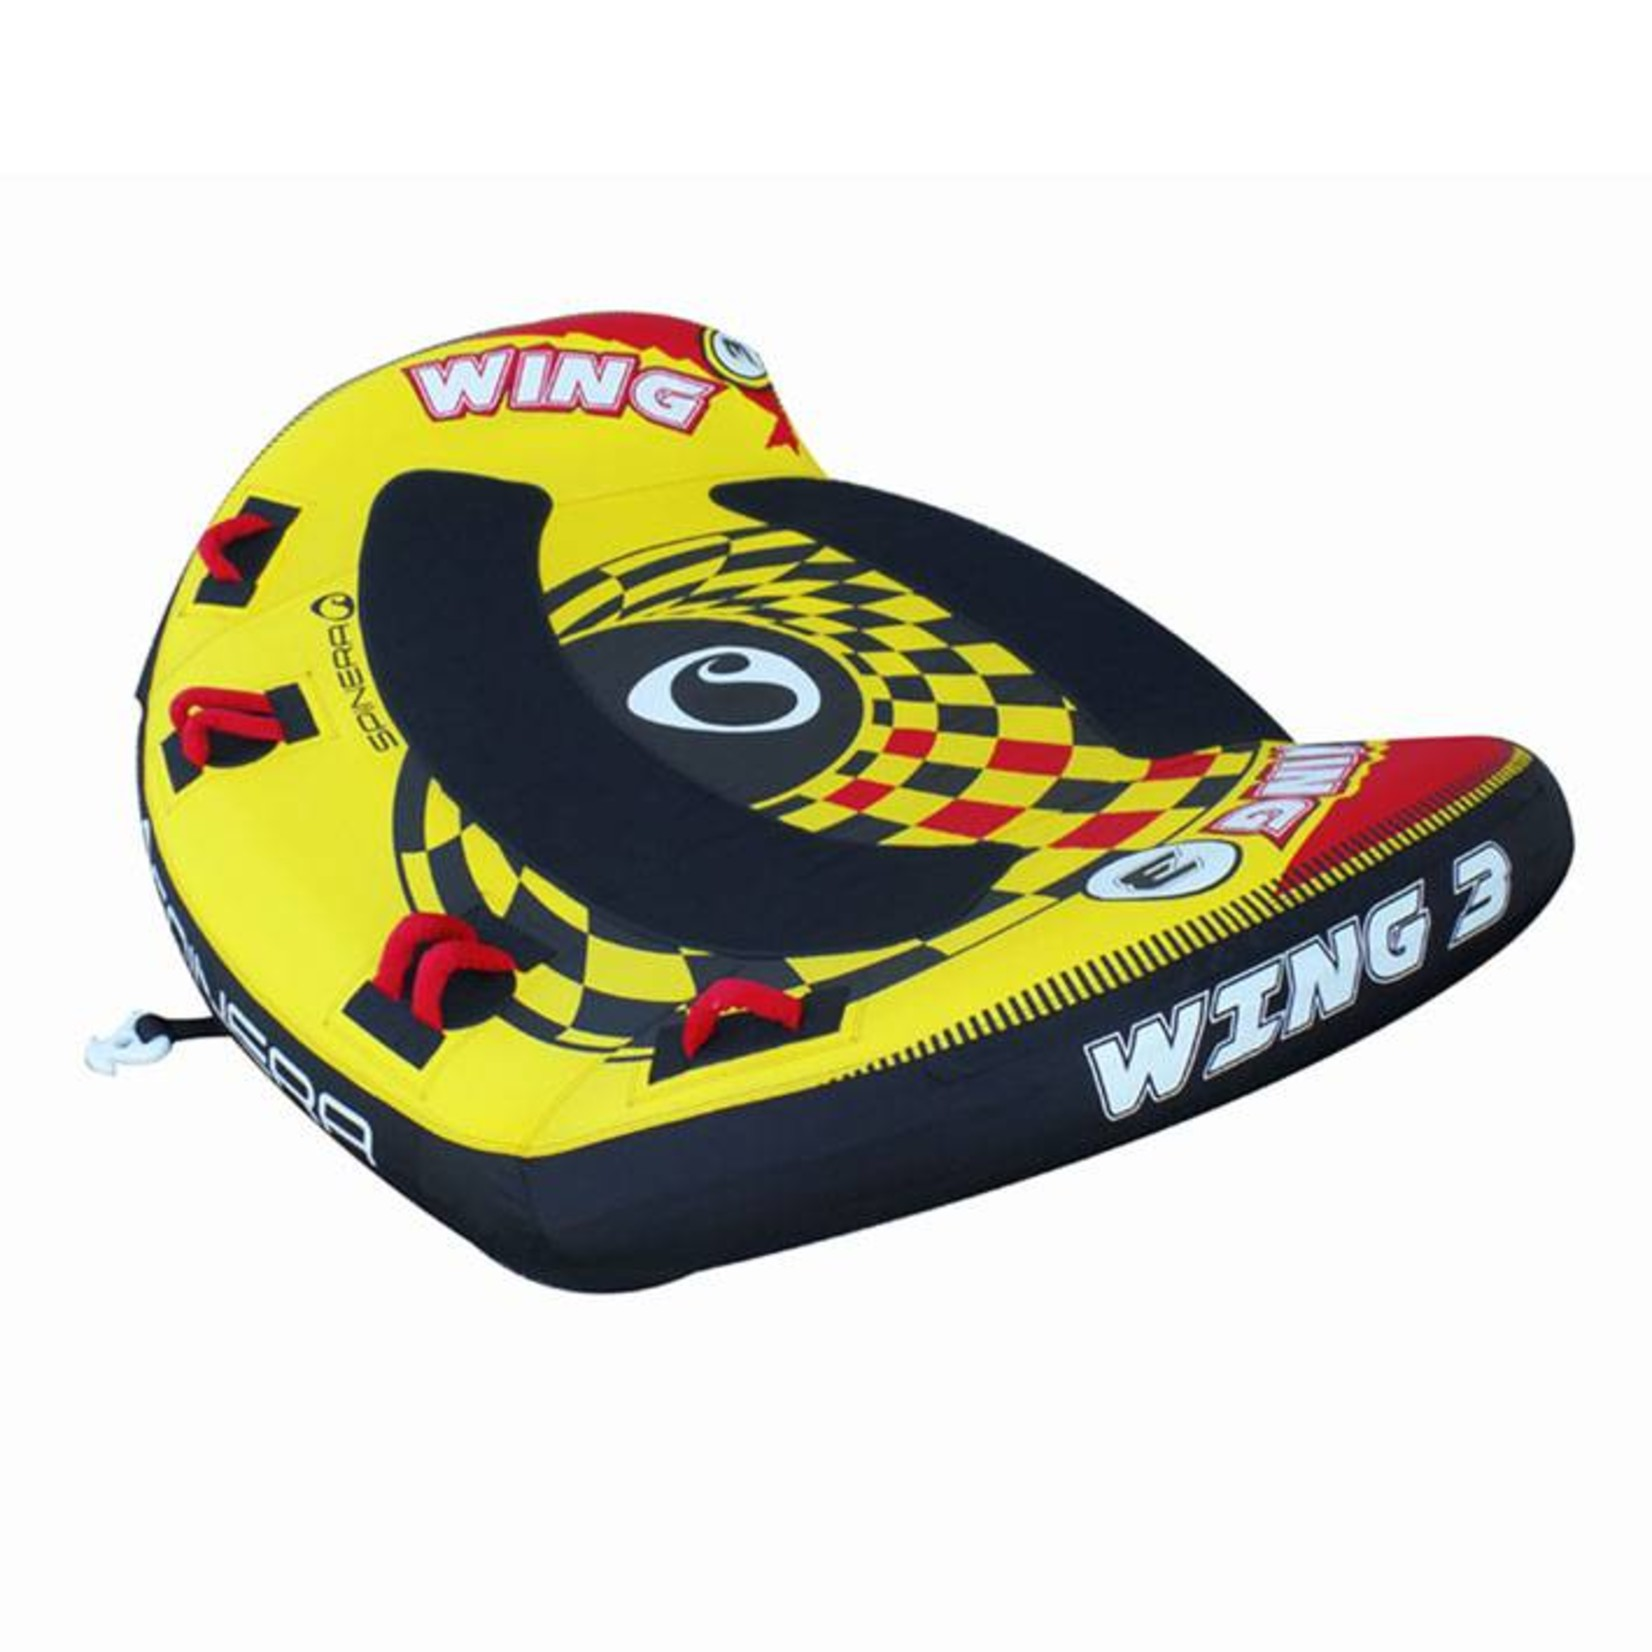 Wing 3 - Triple Tube